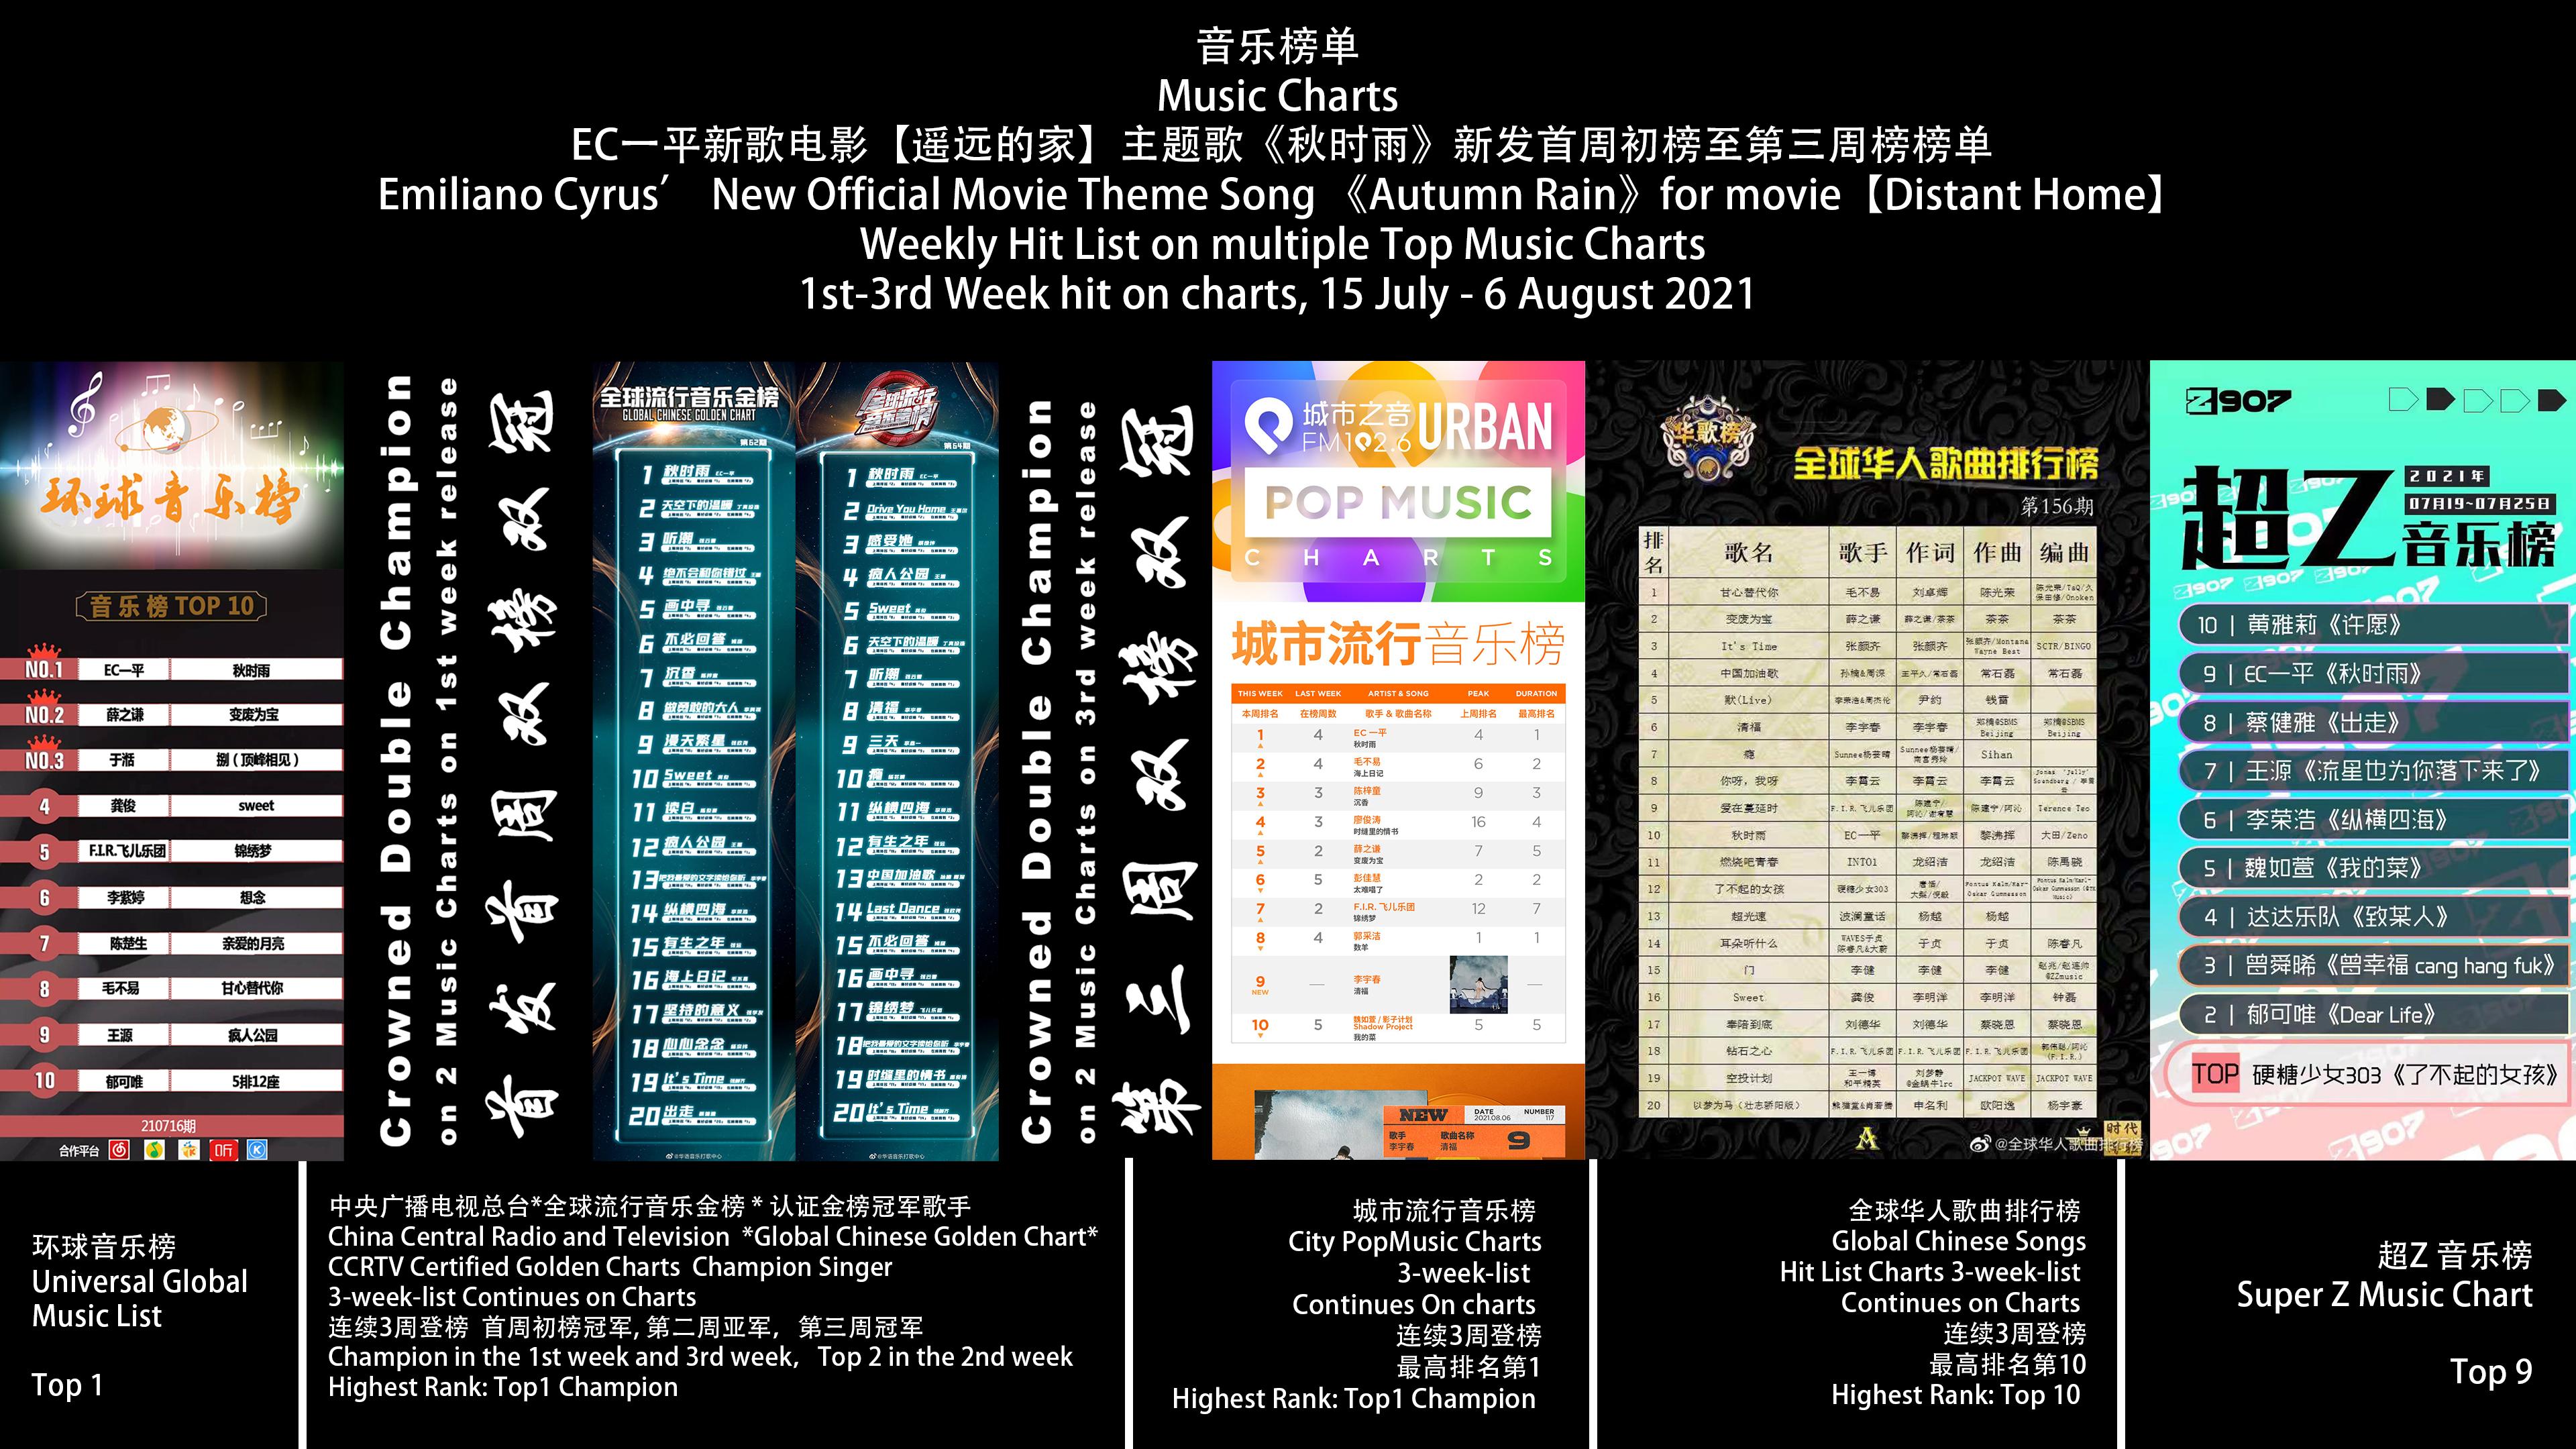 http://img.toumeiw.cn/upload/images/20210814/359fa7d160c9db0f92451ca5a23d4c2f.jpg